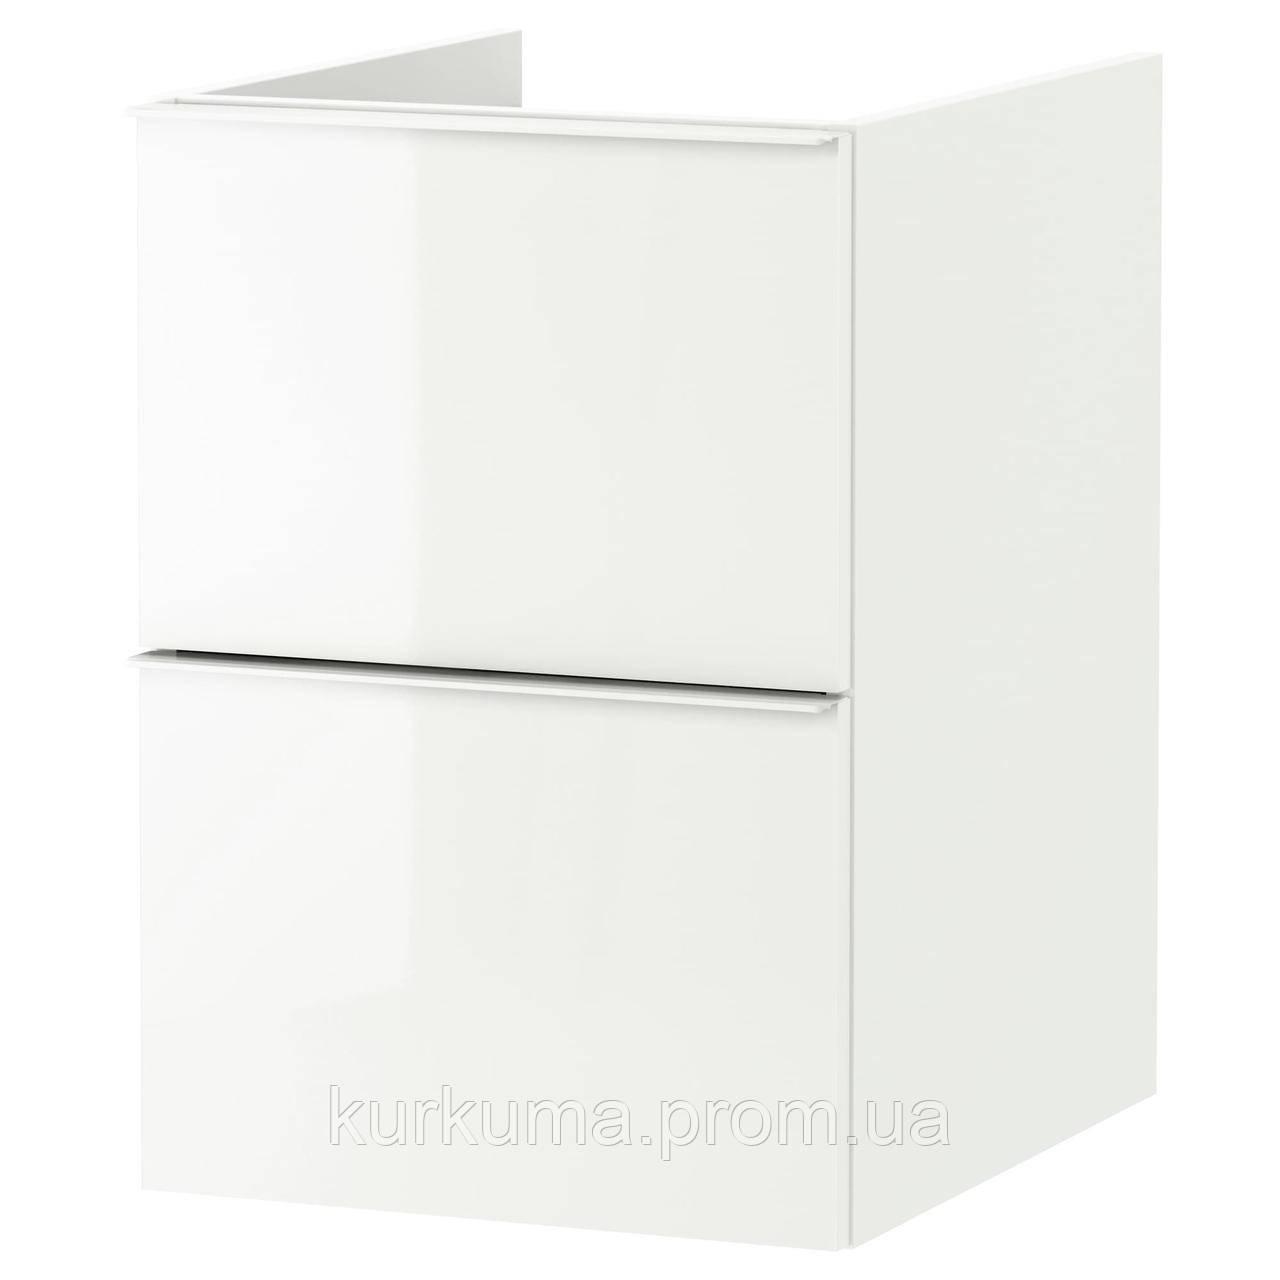 IKEA GODMORGON Шкаф под умывальник, глянцевый белый  (903.246.51)